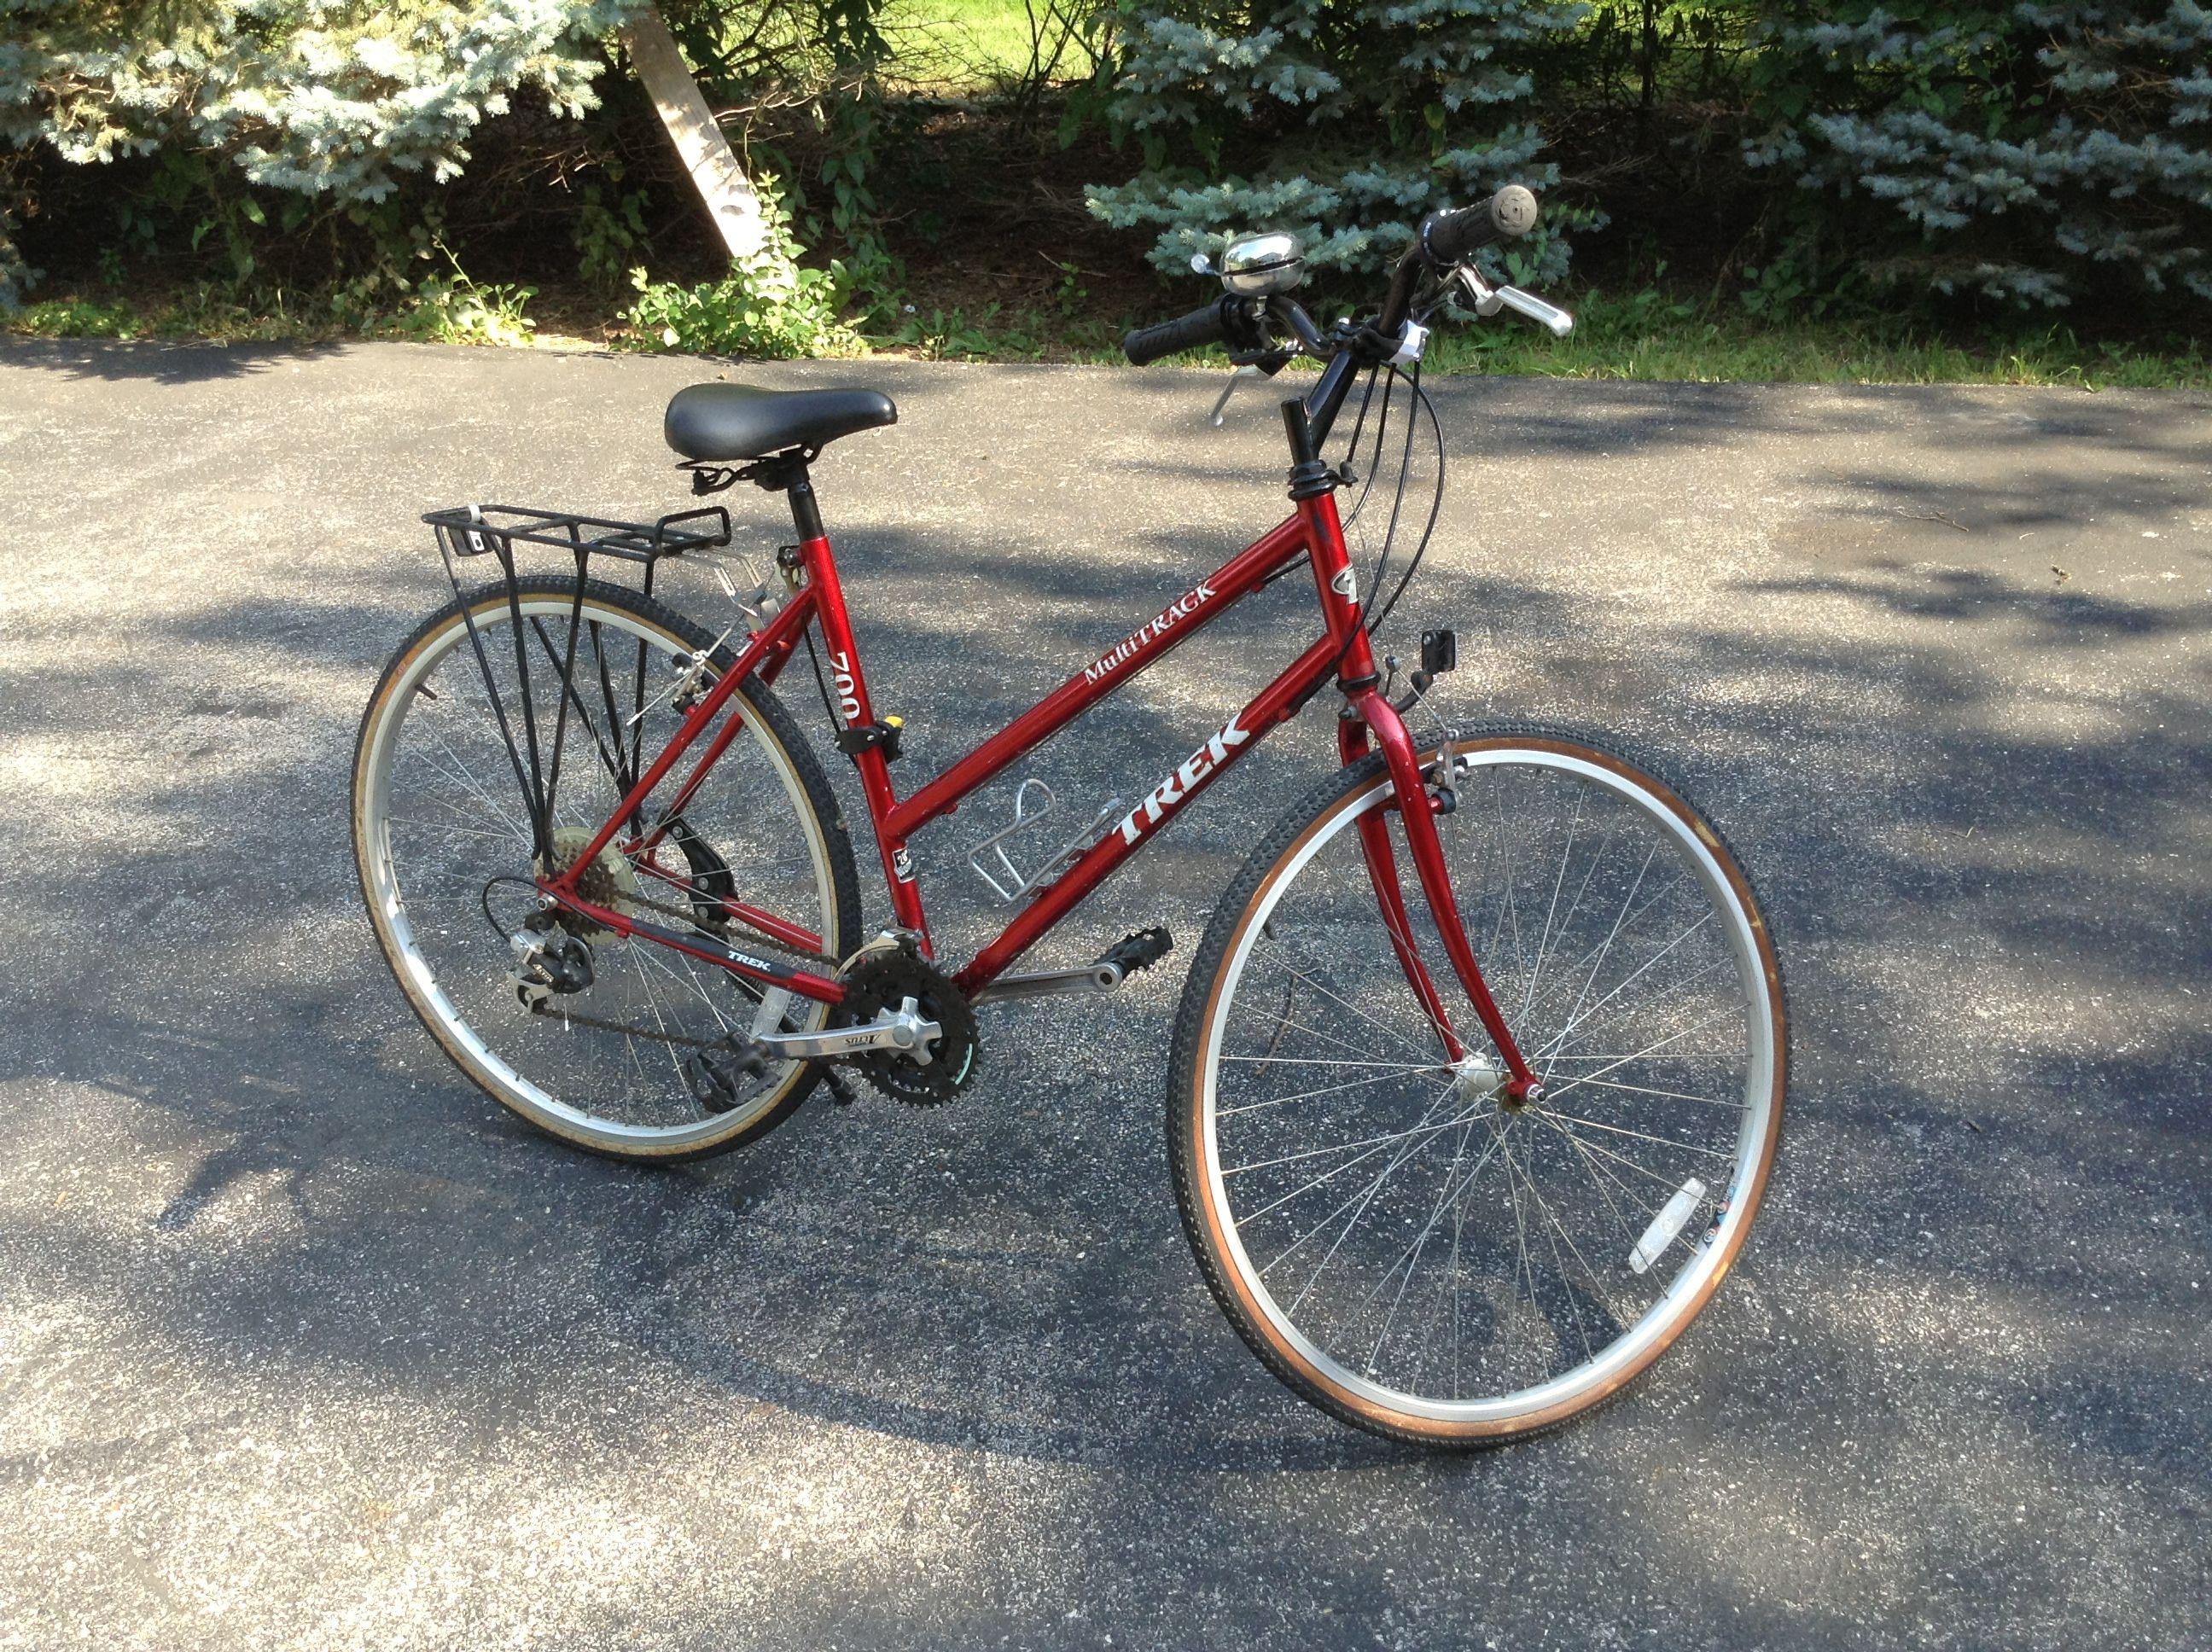 Red Trek Multitrack 700 20 Woman S 10 Speed Hybrid Bike Bell U Lock Water Bottle Holder Rear Wheel Rack Included Price Hybrid Bike Trek Bikes Bike